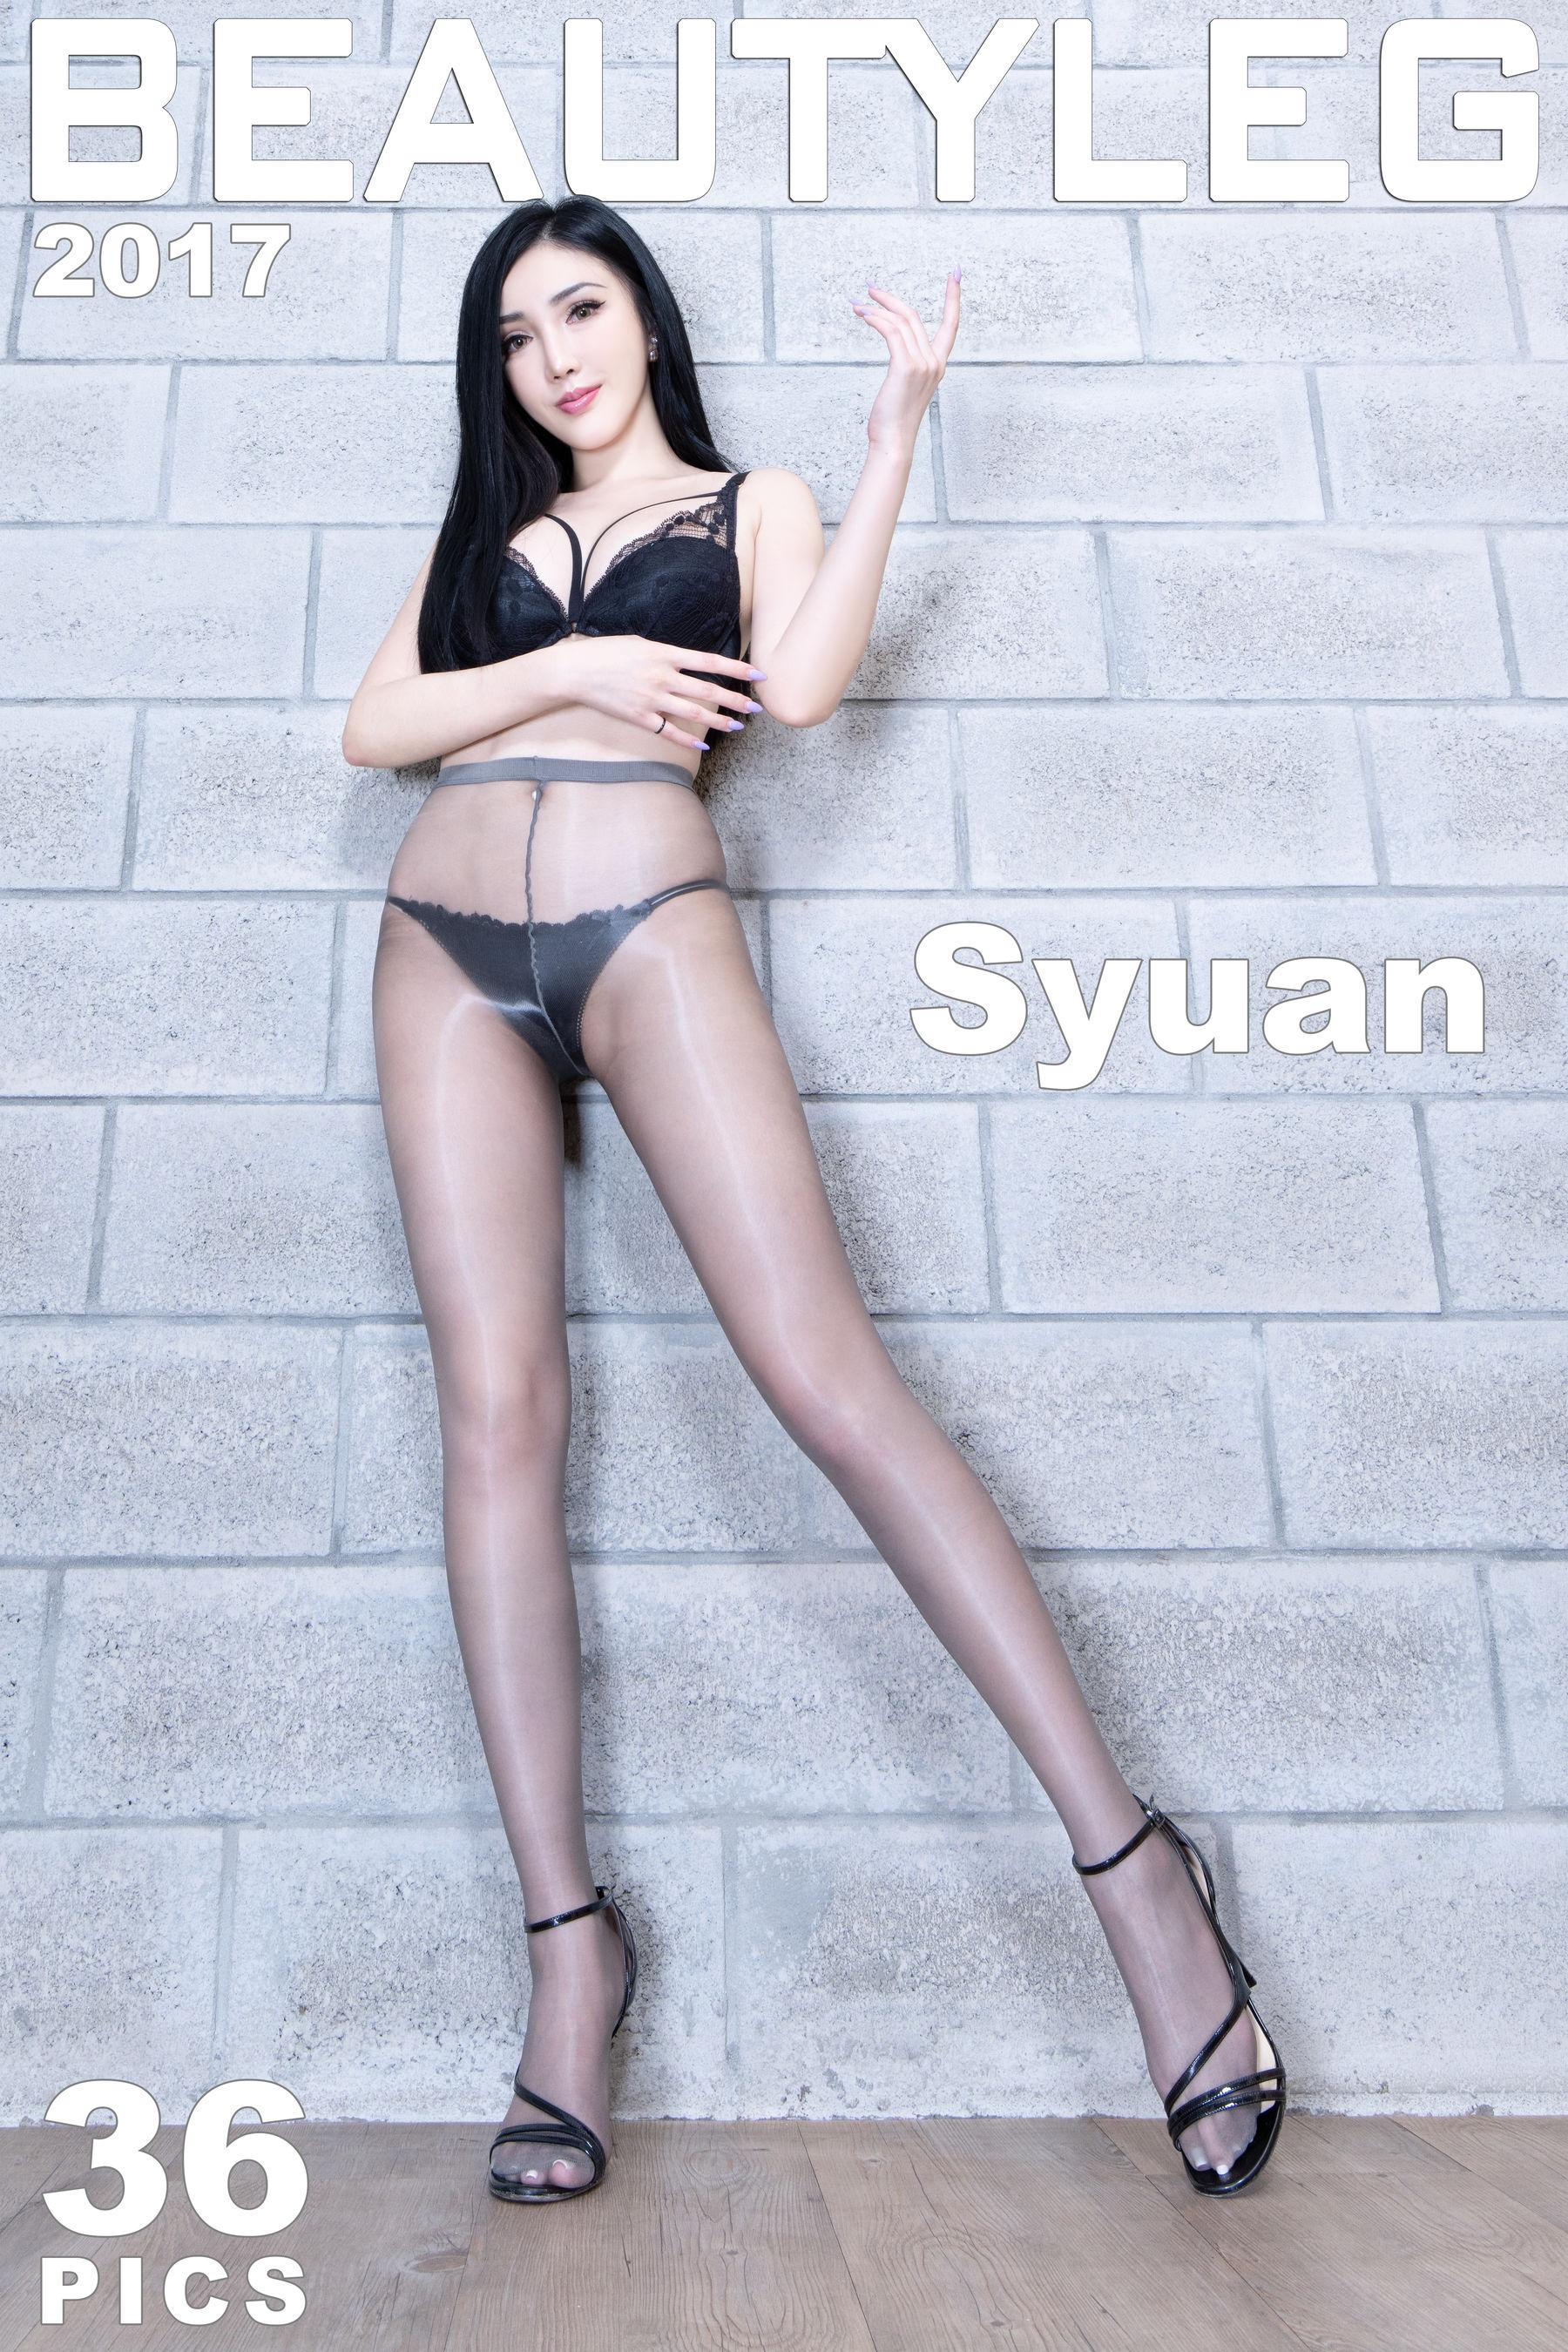 VOL.176 [Beautyleg]黑丝美腿:赵芸(腿模Syuan,Syuan赵芸)超高清个人性感漂亮大图(36P)